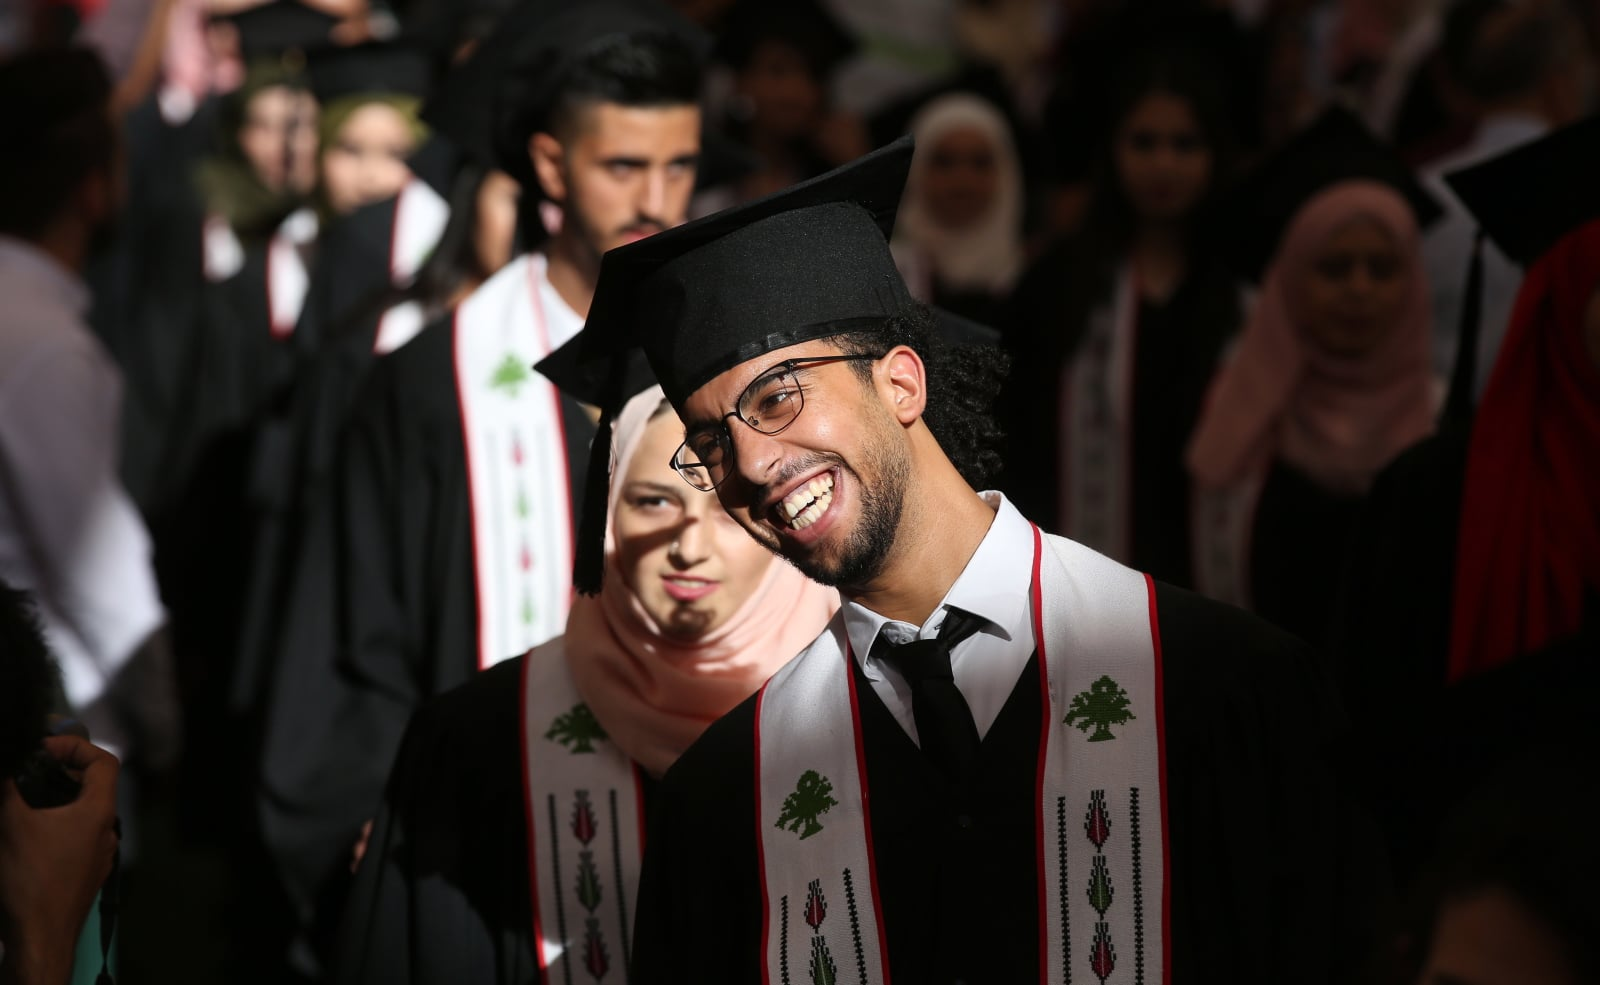 Absolutorium na palestyńskim uniwersytecie fot. EPA/ALAA BADARNEH  Dostawca: PAP/EPA.